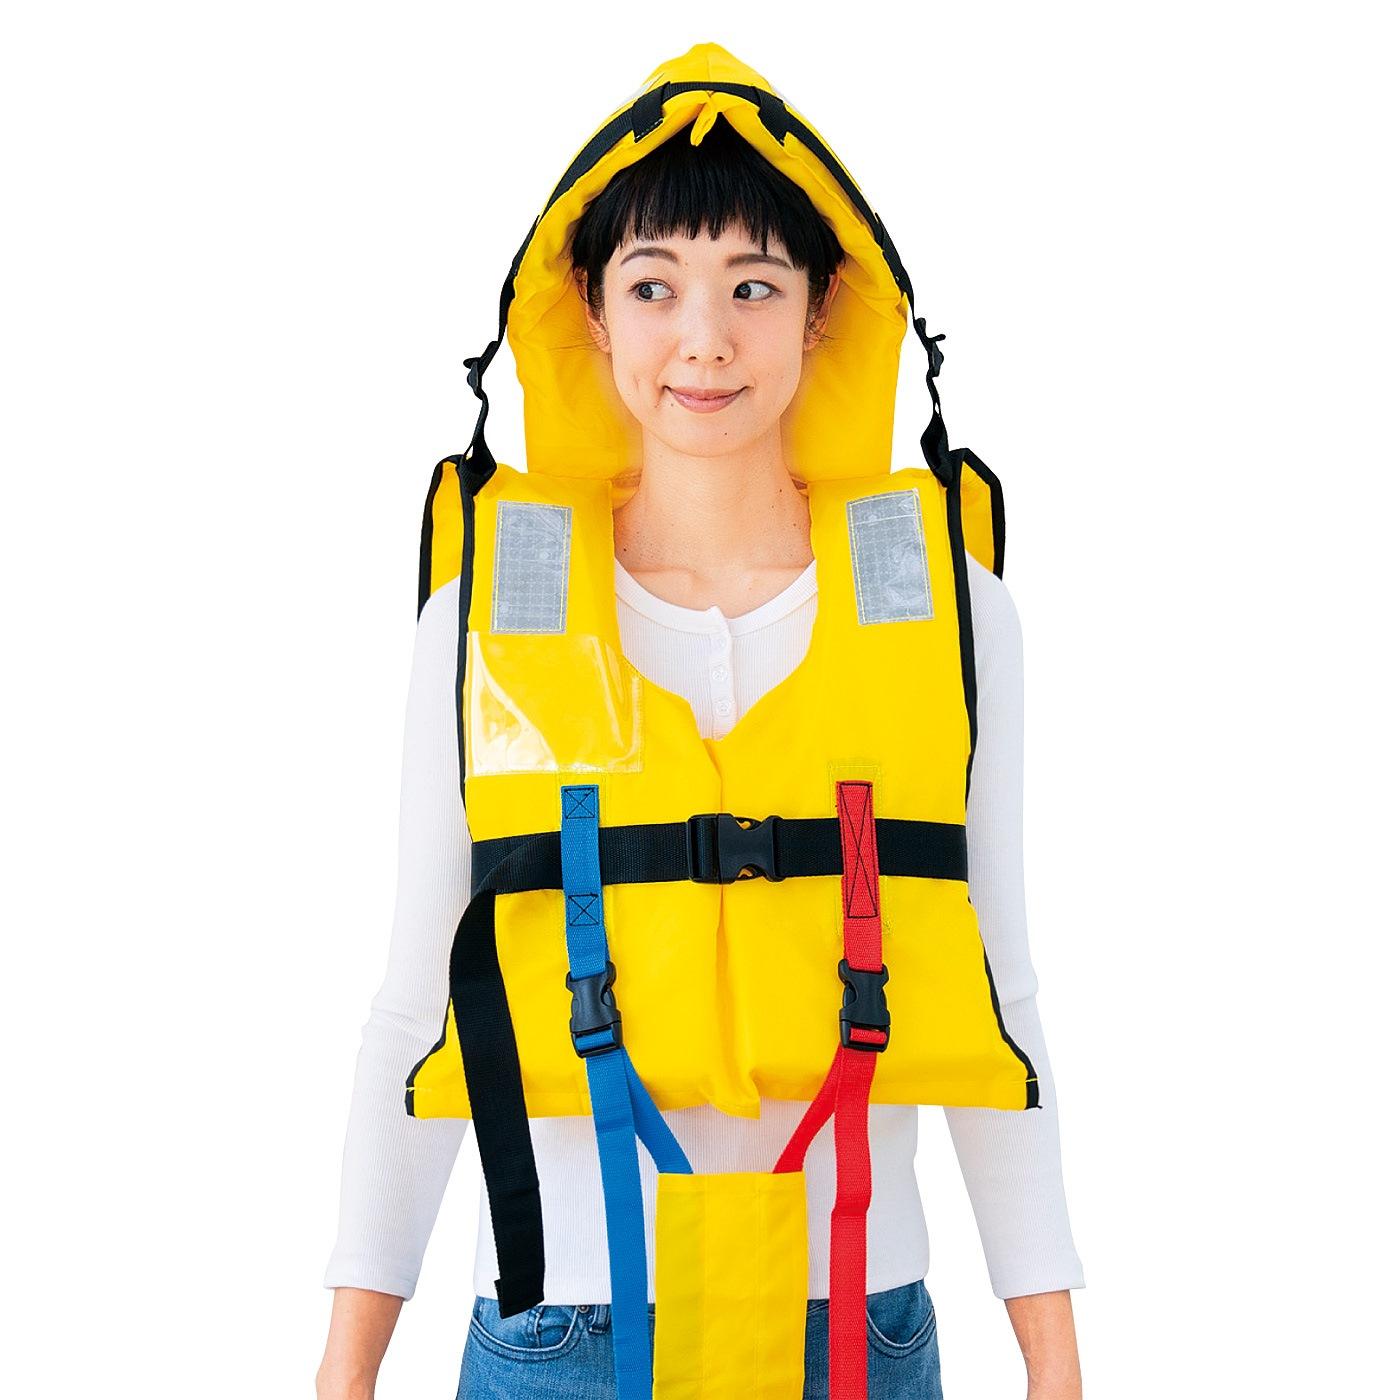 Kraso[クラソ]  防護頭巾付きで頭もガード 水害対策に備えたい ライフジャケット大人用〈150cm~〉